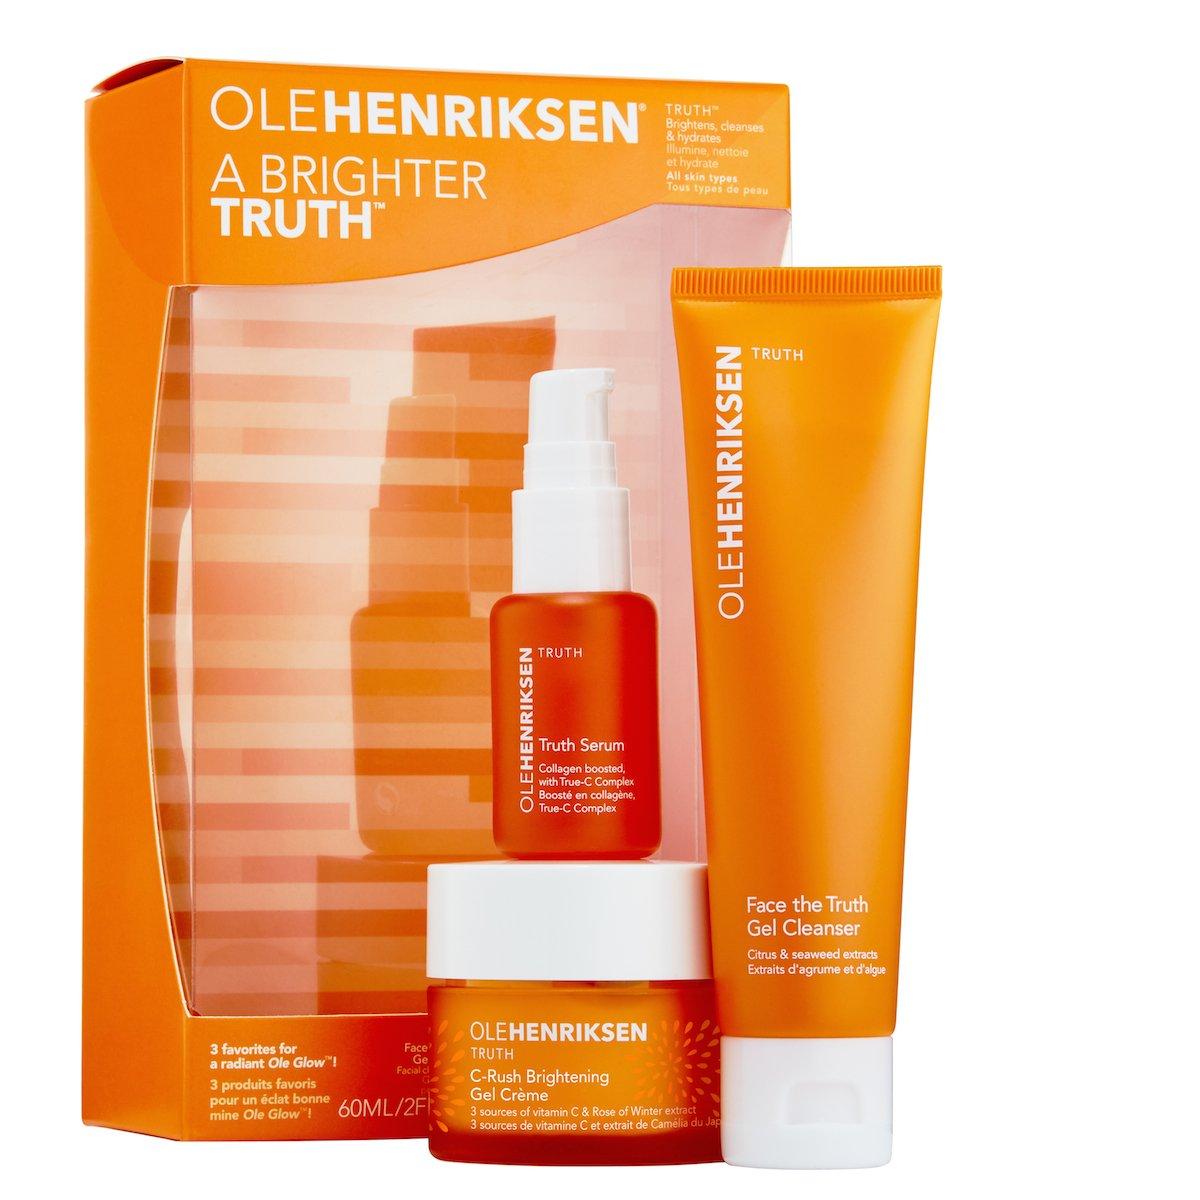 Ole Henriksen Truth Serum Kit